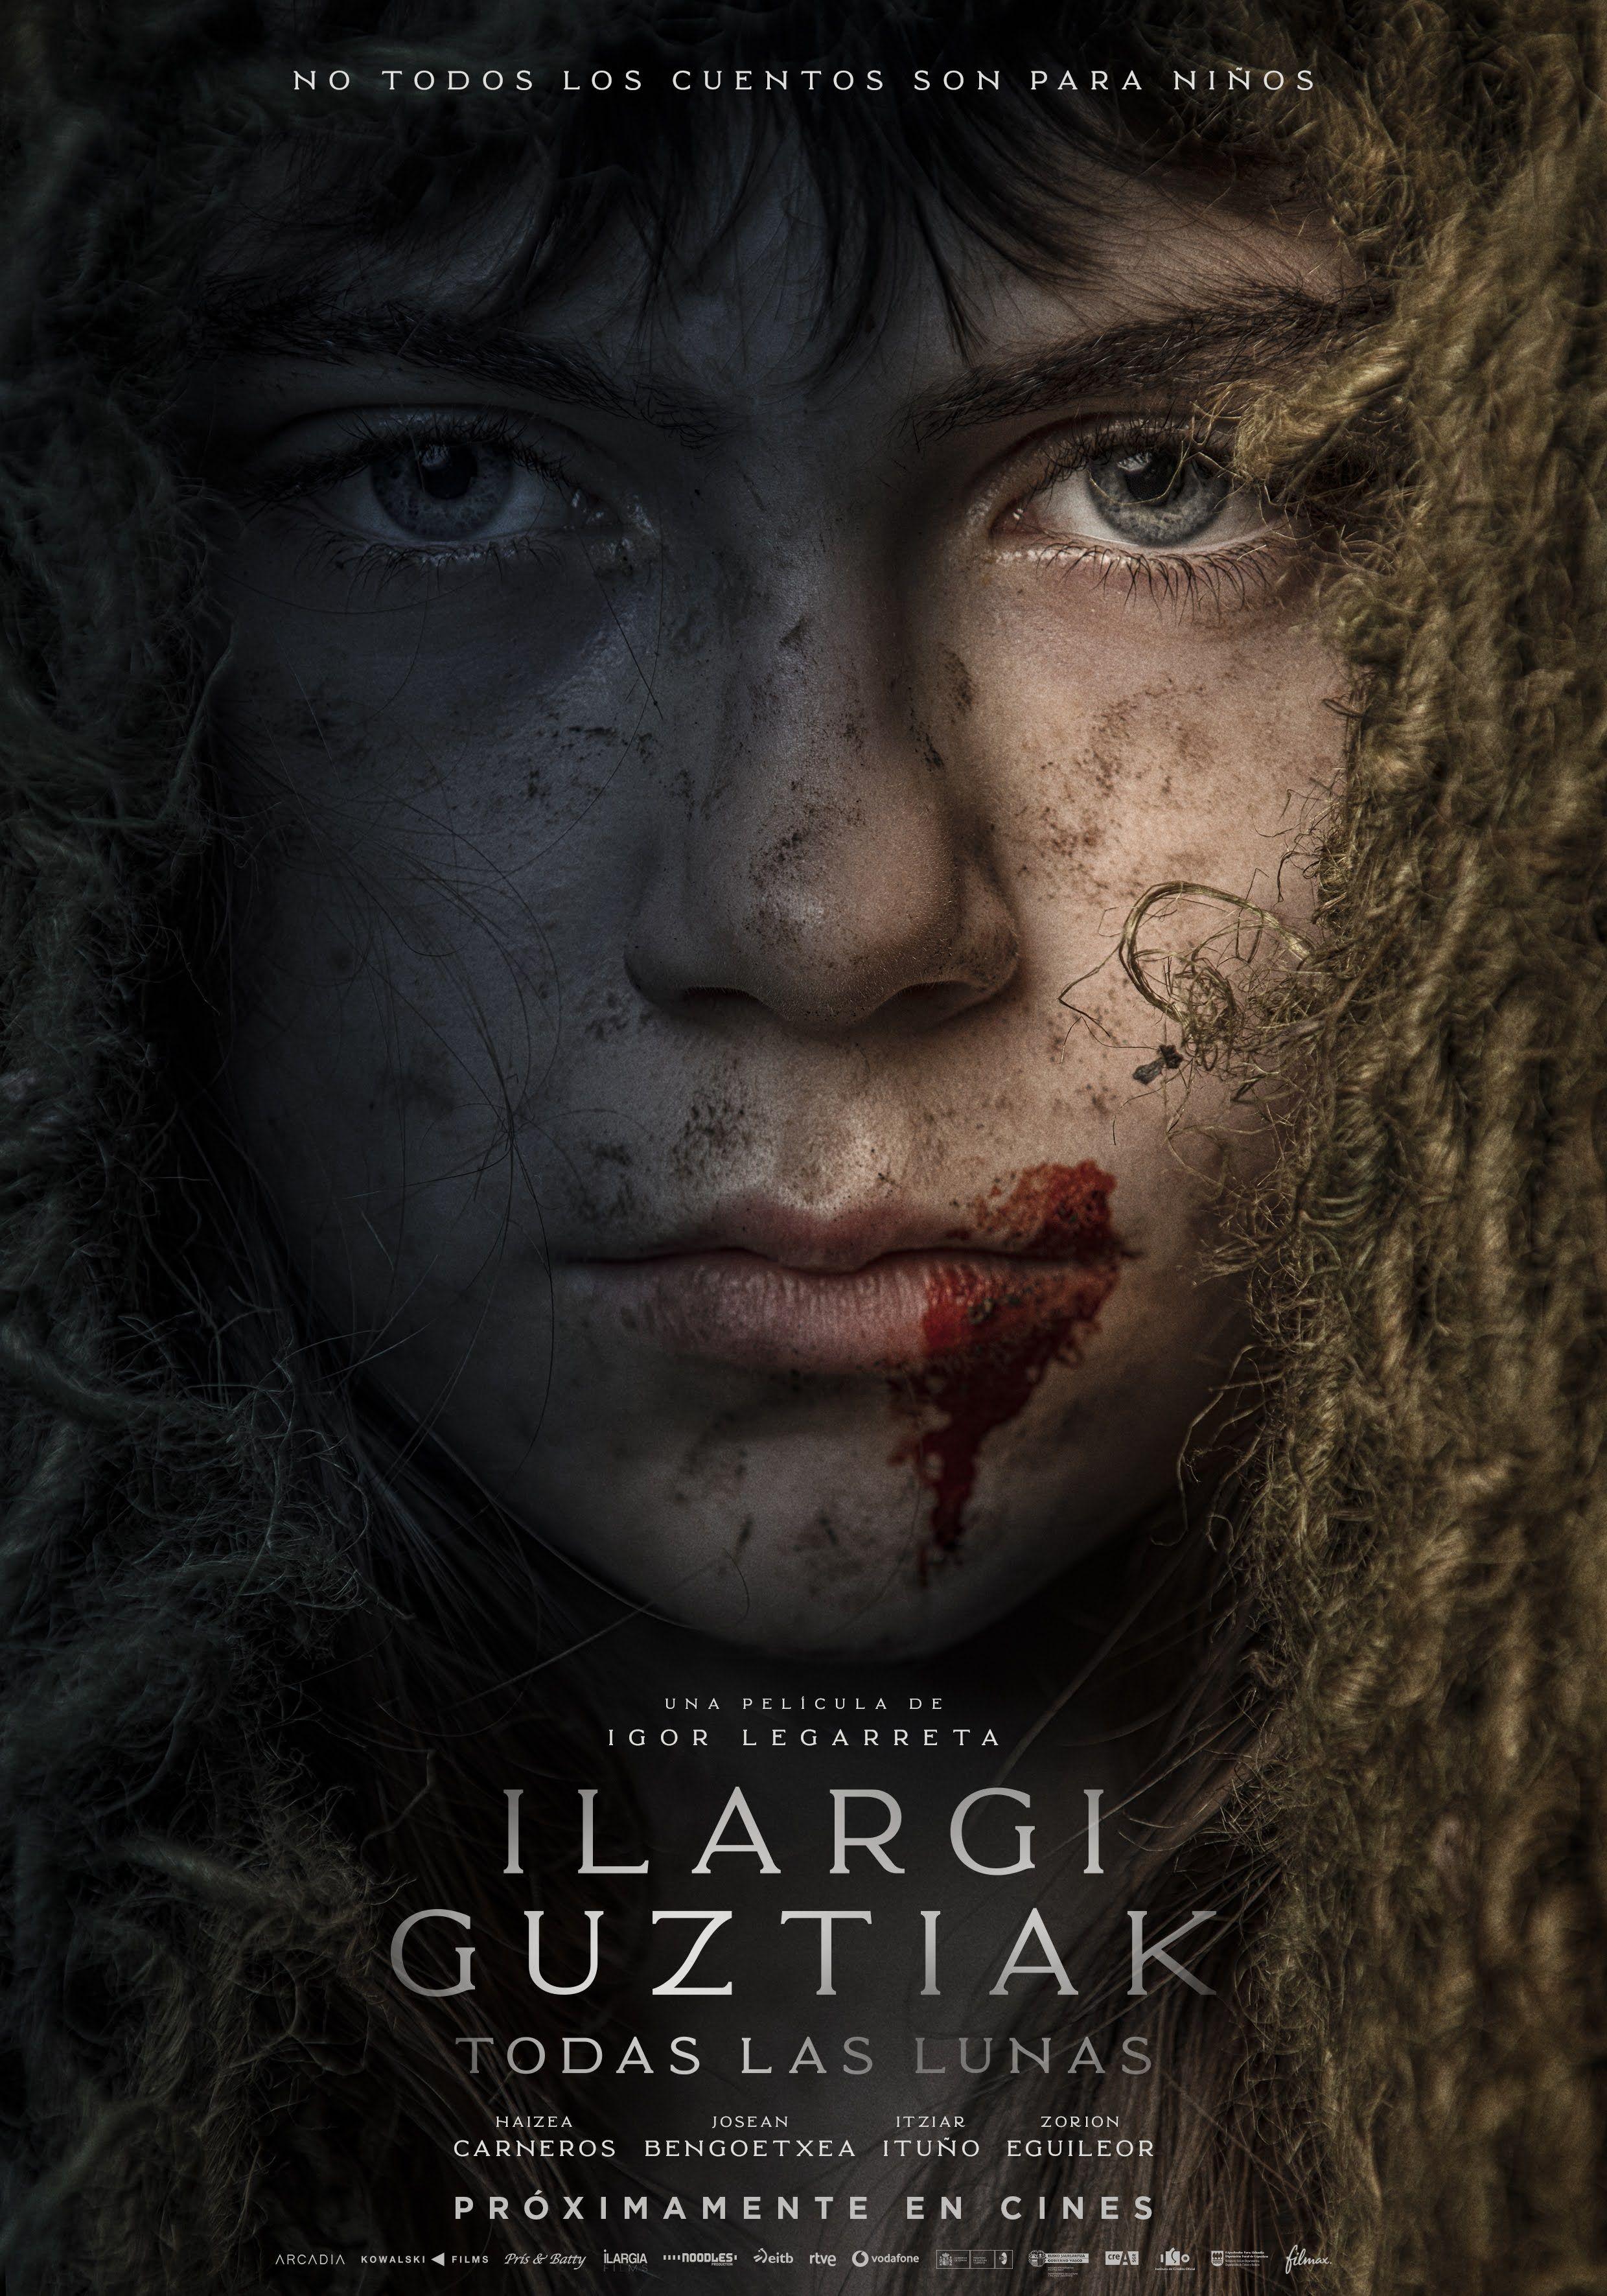 Todas Las Lunas Ilargi Guztiak Carteles De Cine Cine Peliculas